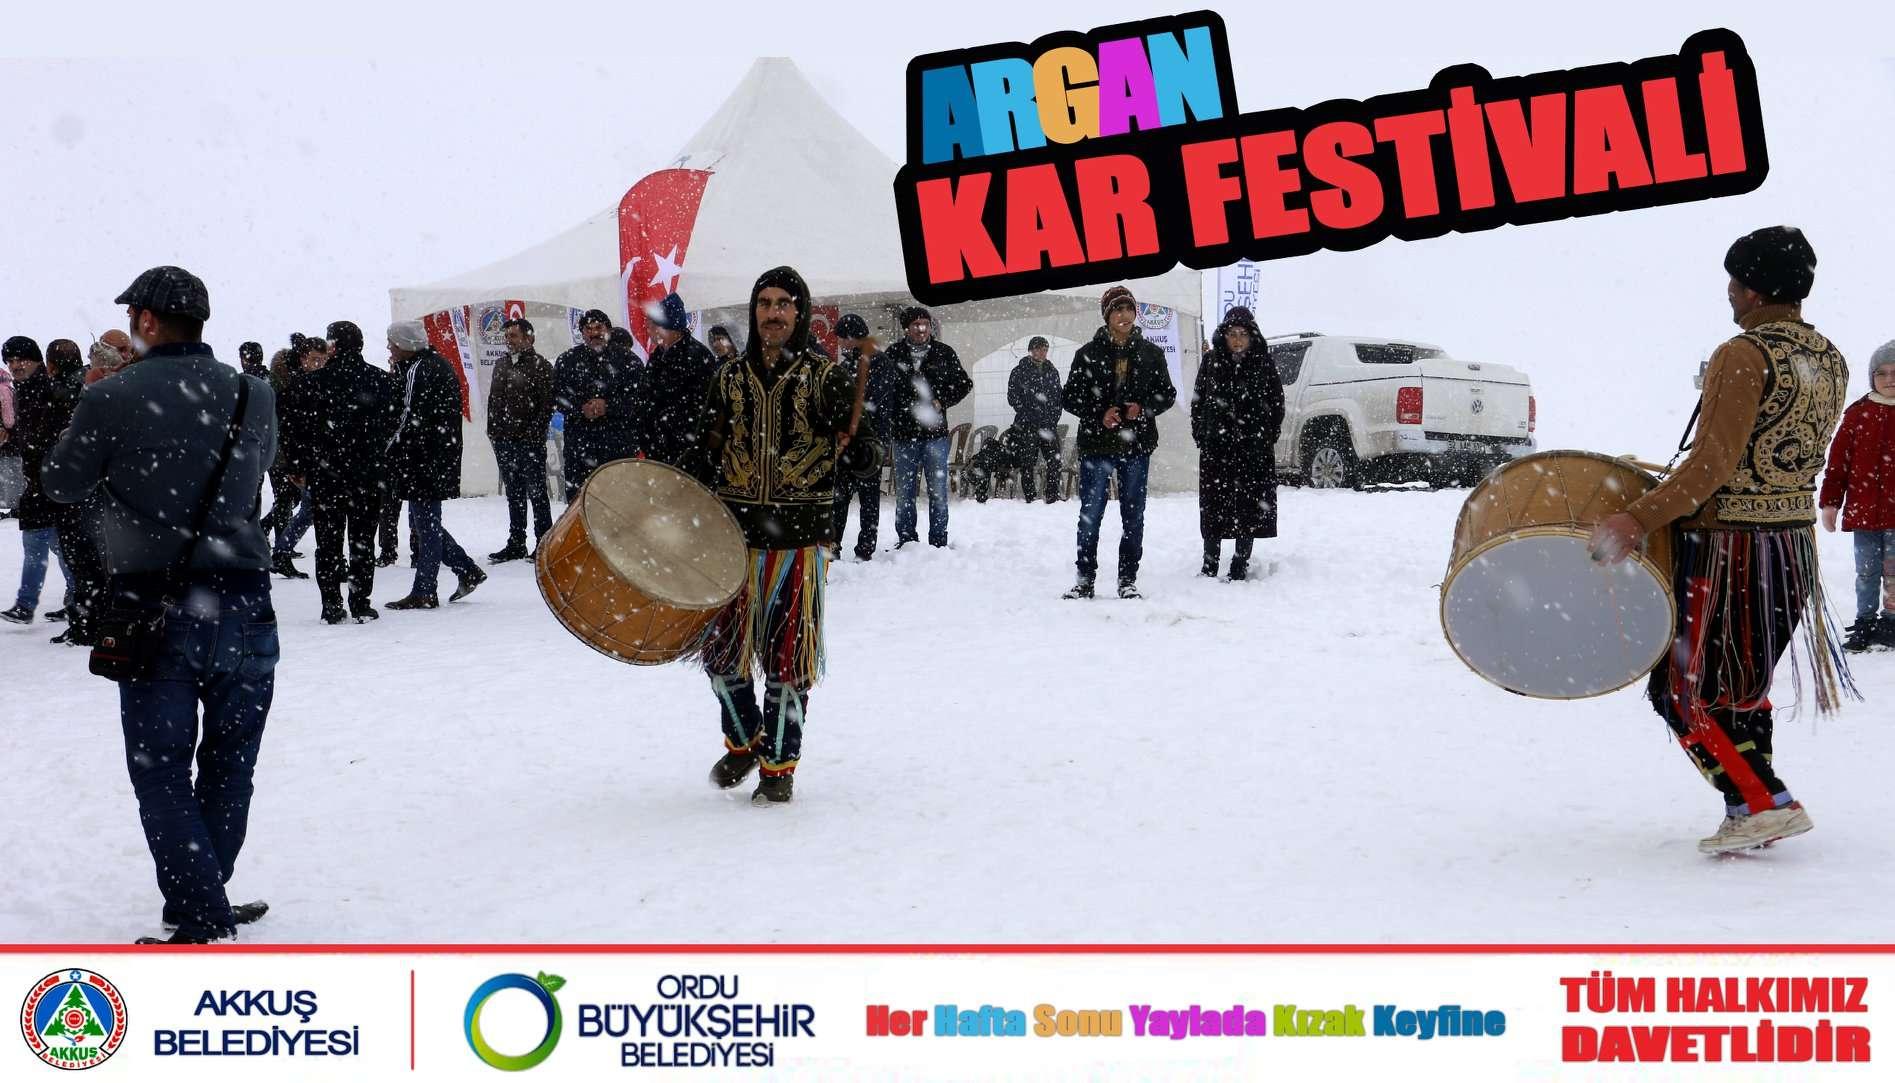 argan-kar-festivali-1860